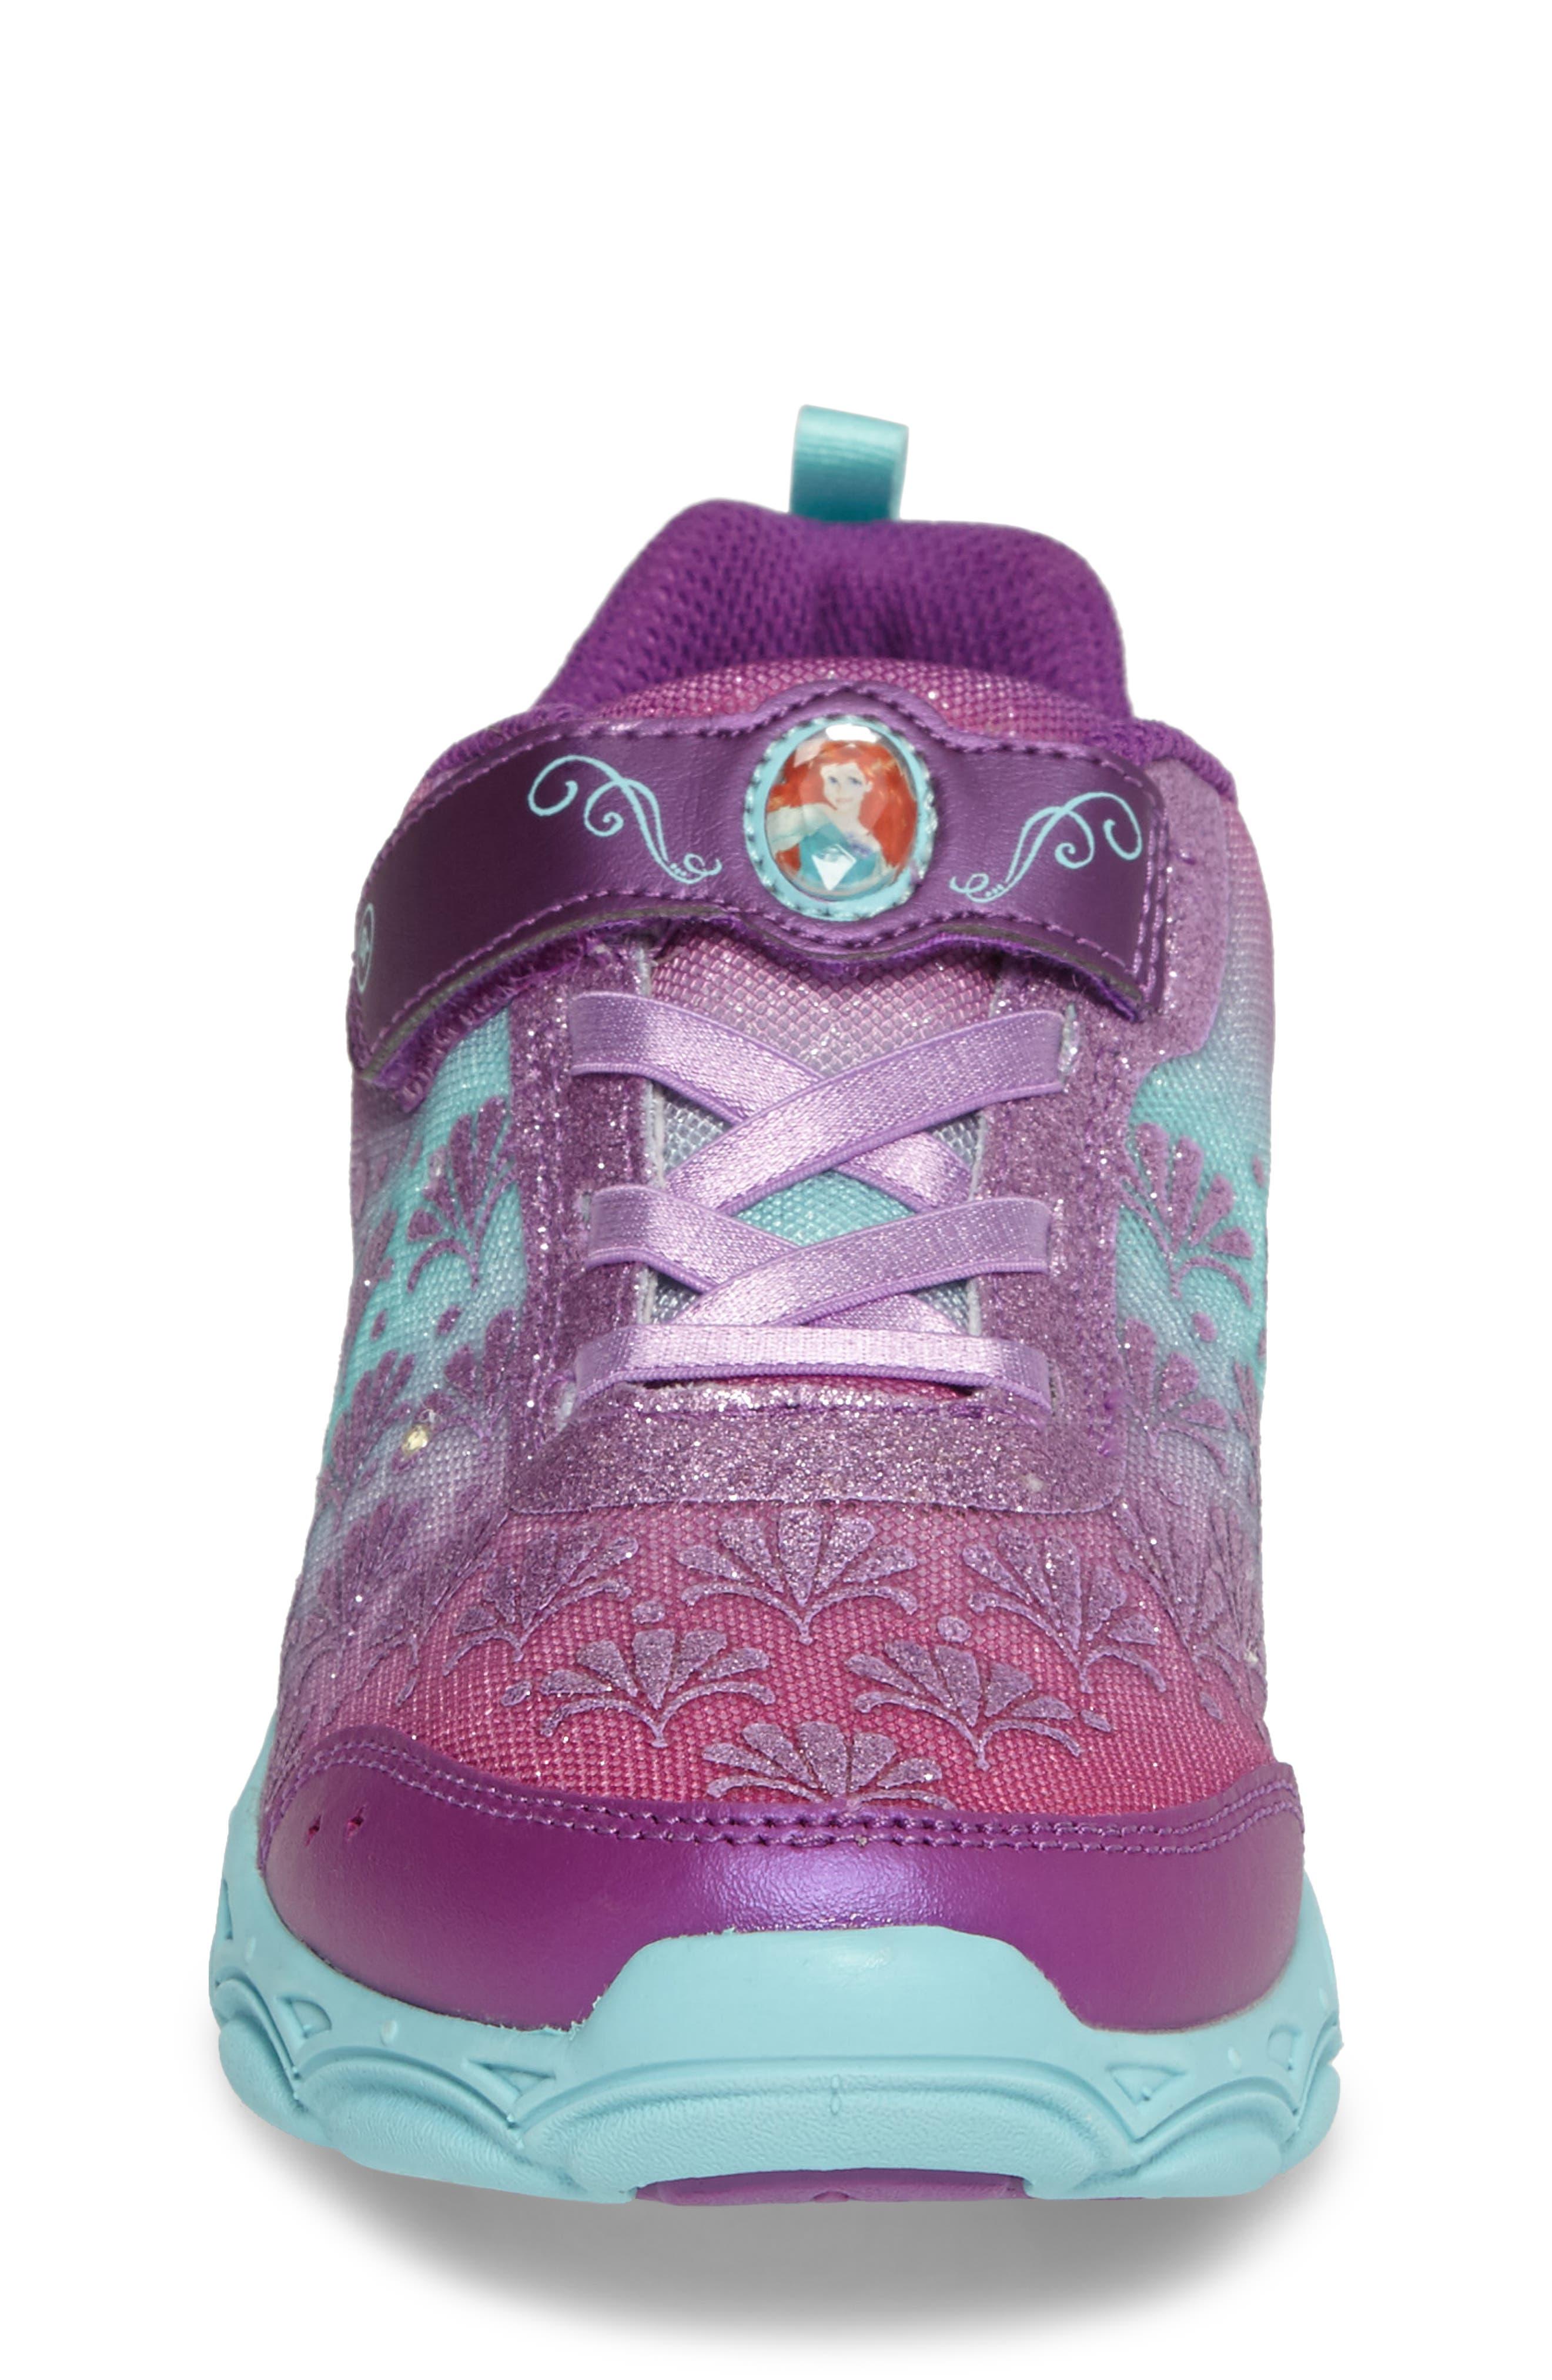 Disney<sup>®</sup> Ariel Ocean Adventurer Light-Up Sneaker,                             Alternate thumbnail 4, color,                             650